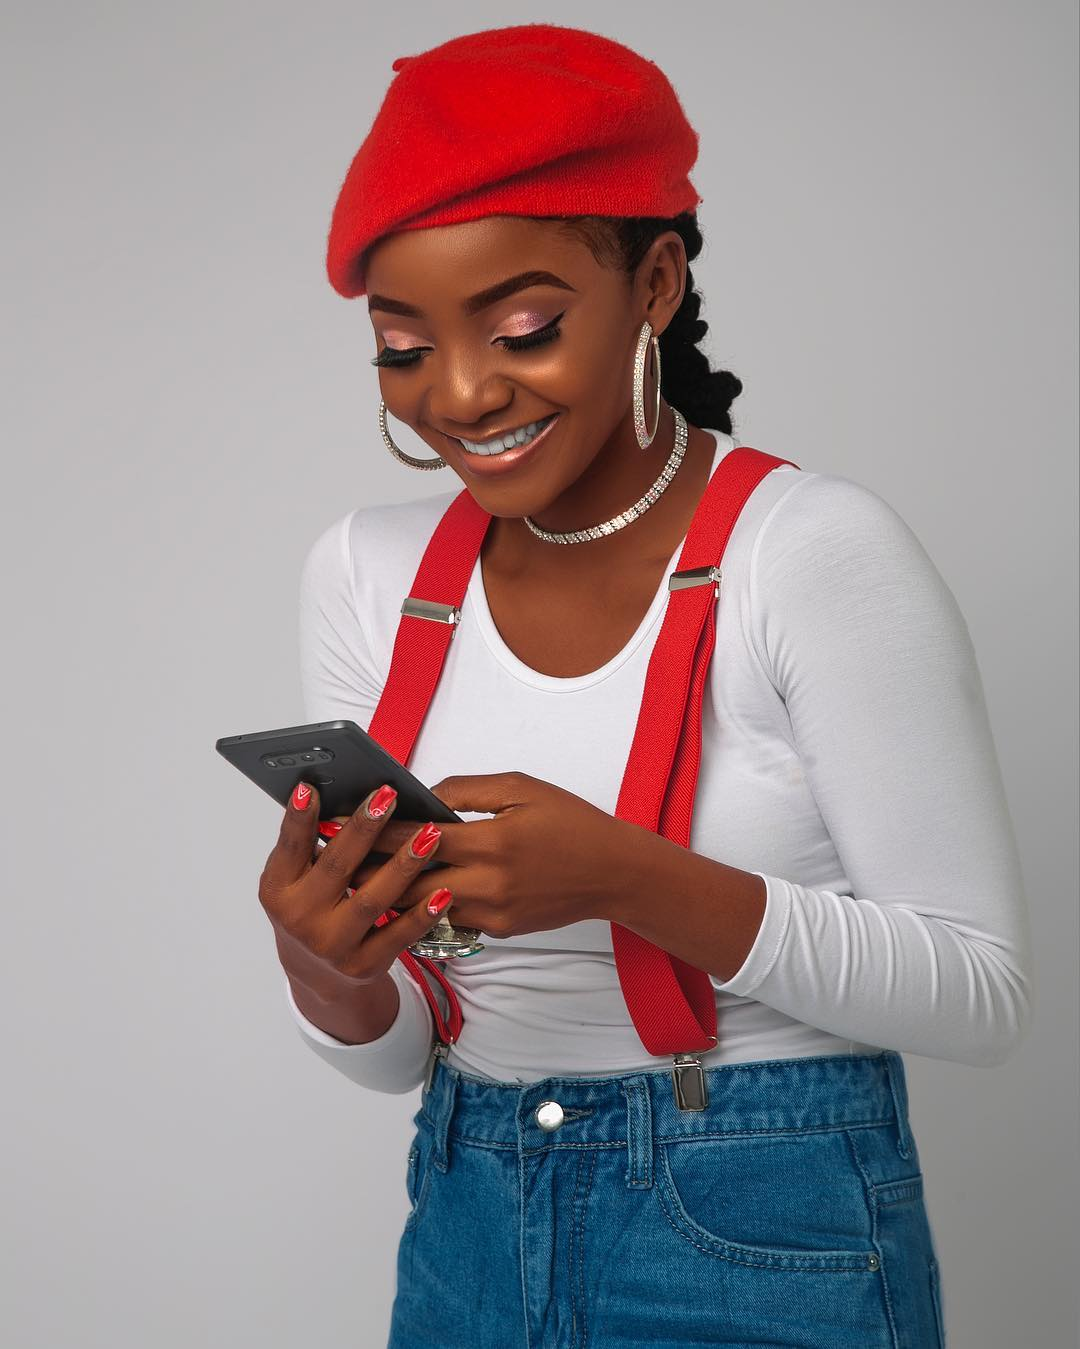 #Womancrushwednesday- Simisola Bolatito Ogunleye